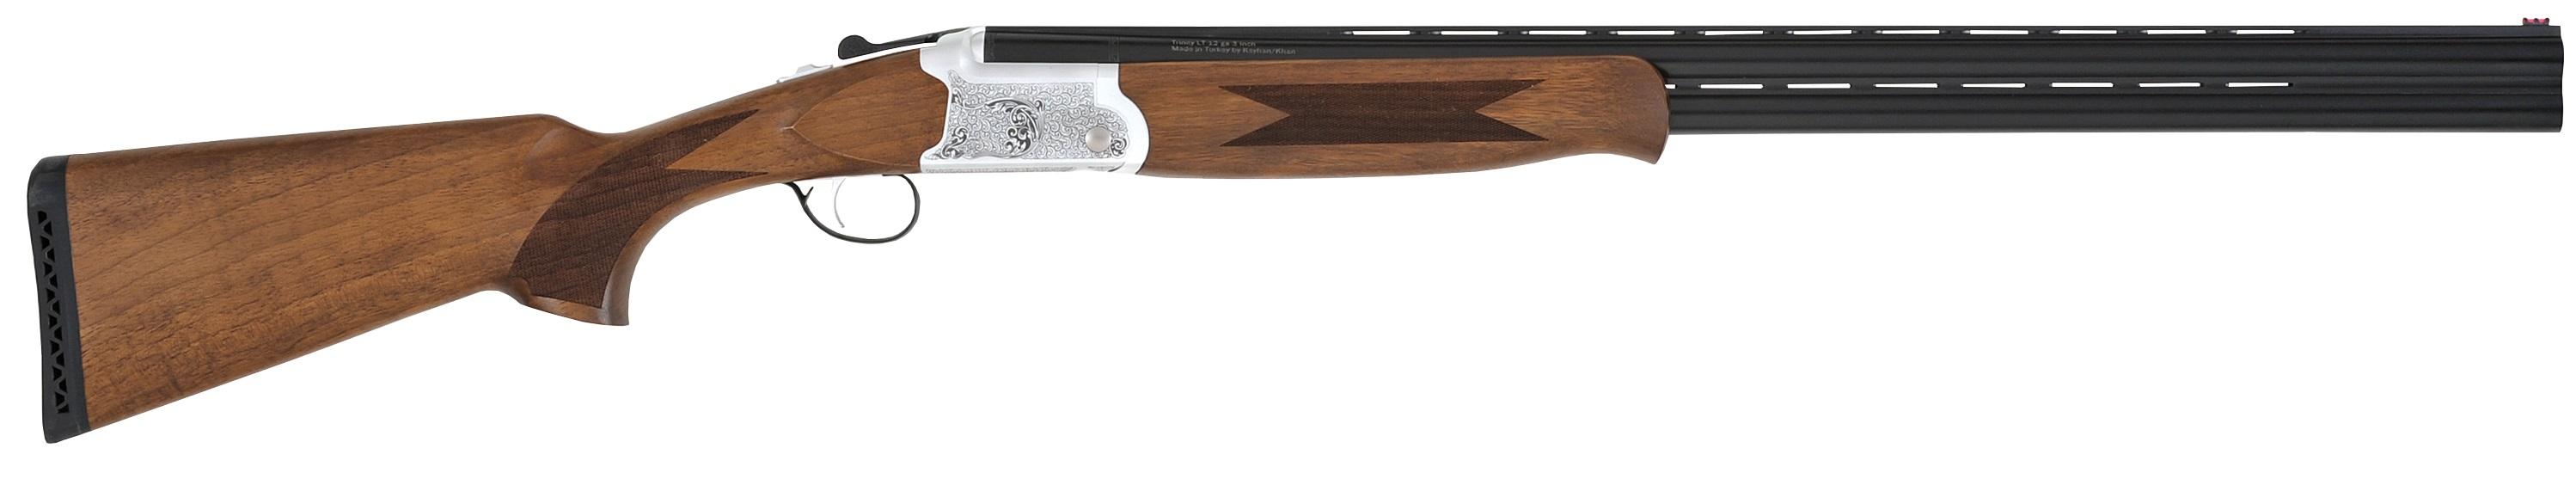 TriStar Sporting Arms Trinity LT 20 Gauge